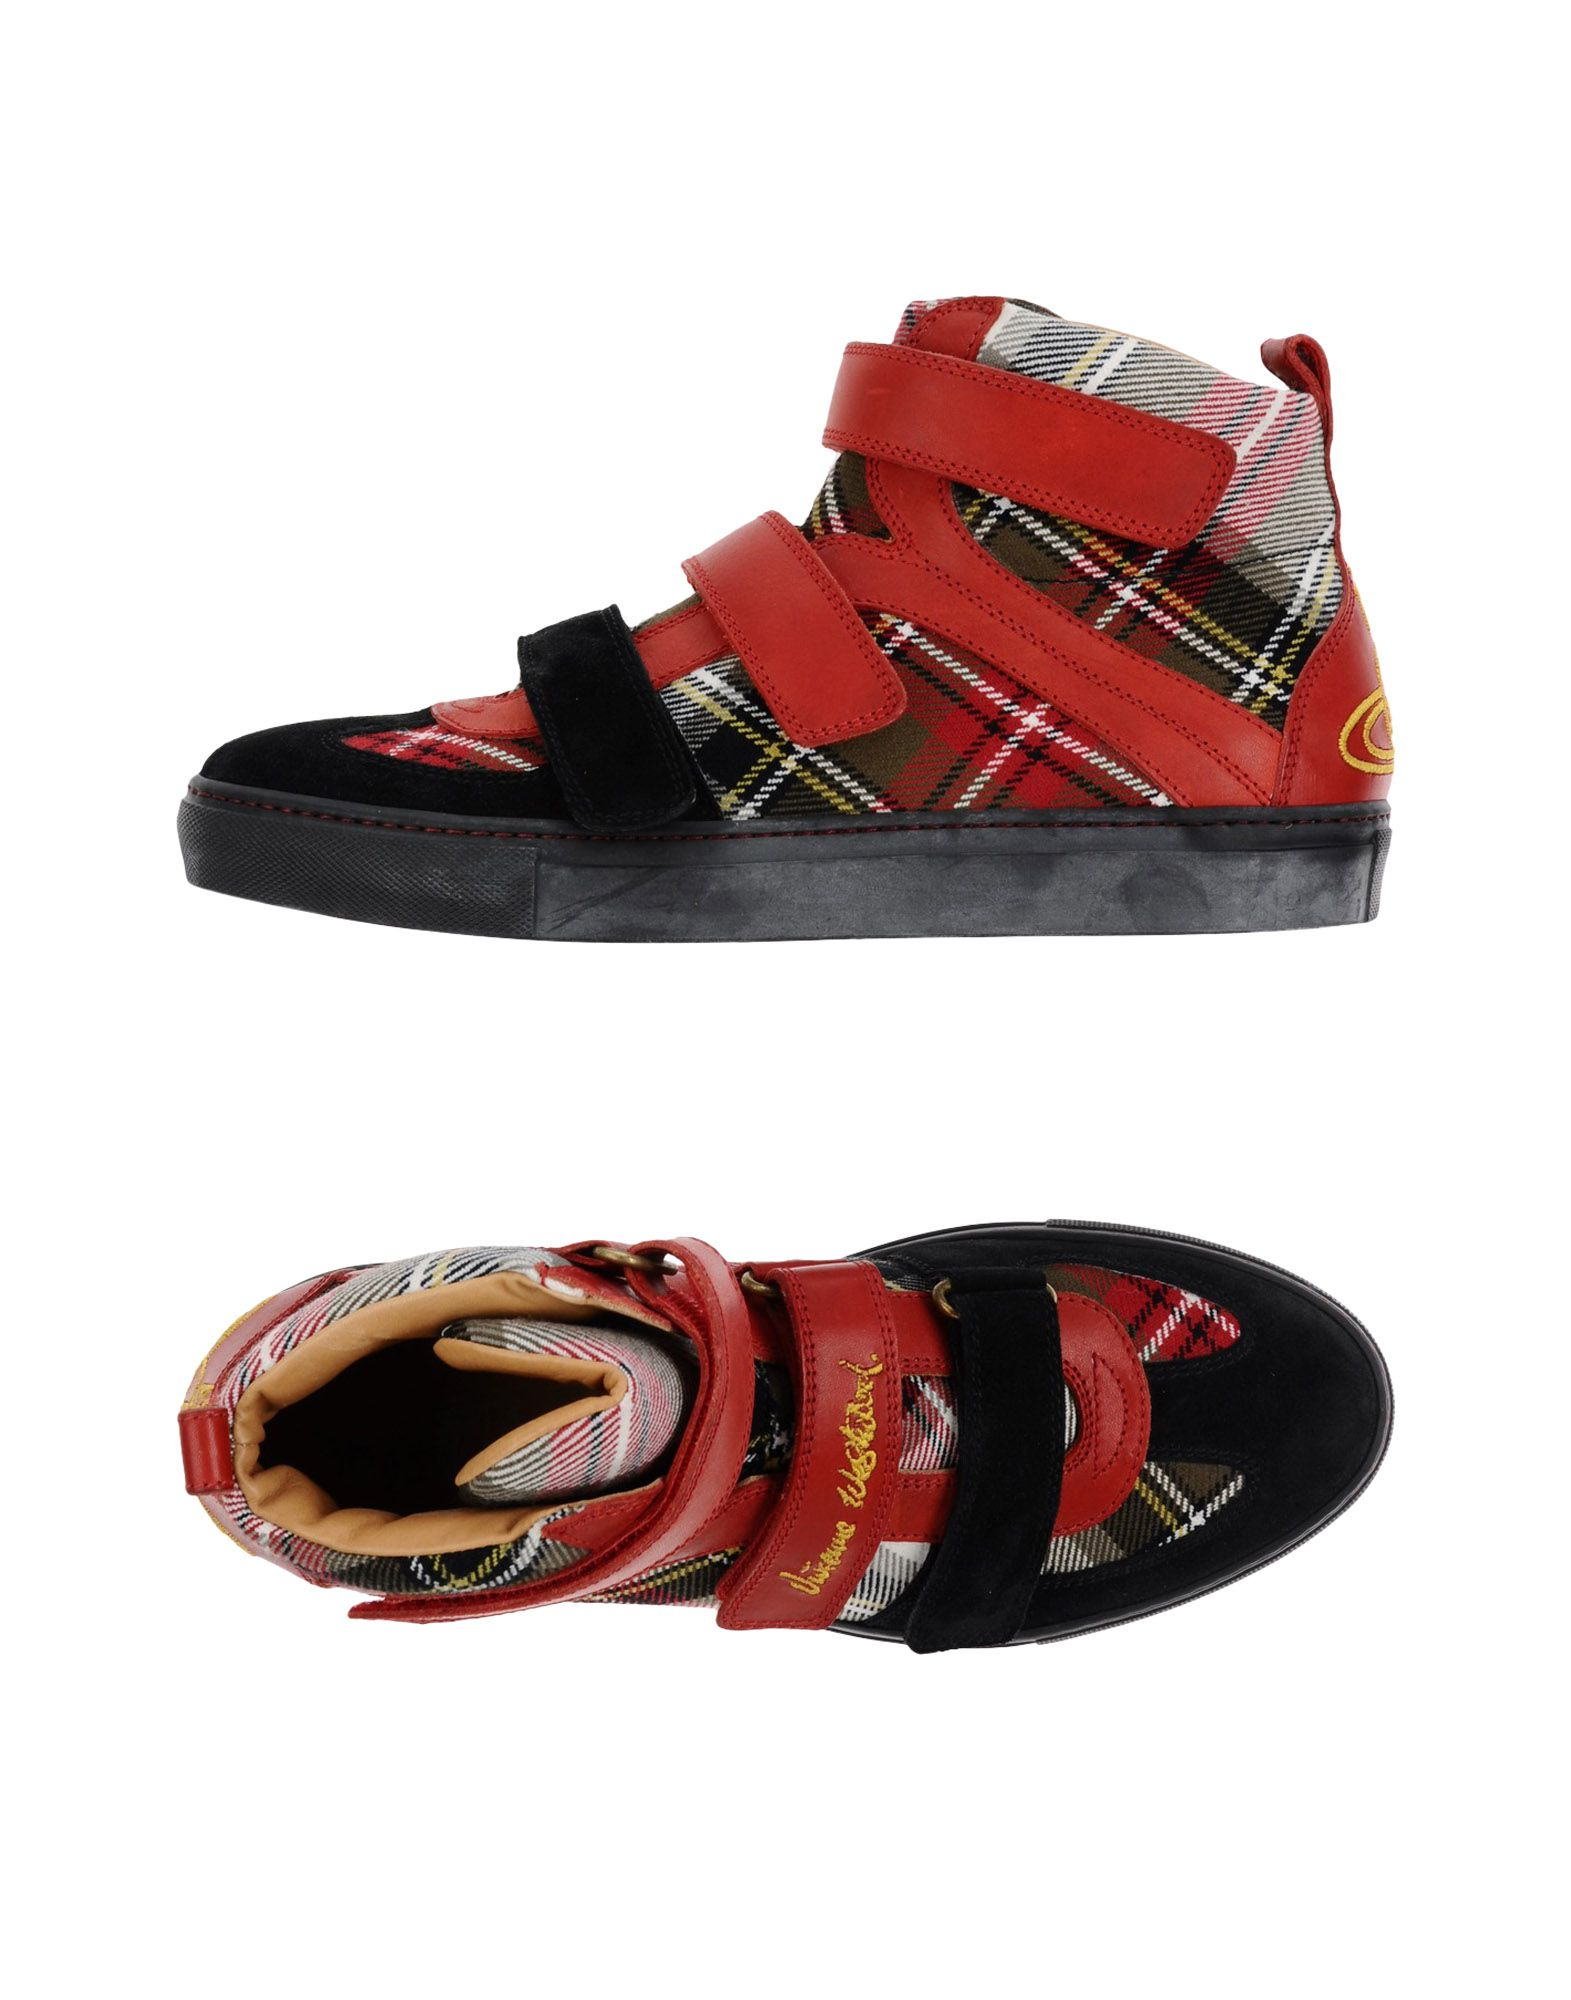 VIVIENNE WESTWOOD MAN Herren High Sneakers & Tennisschuhe Farbe Ziegelrot Größe 9